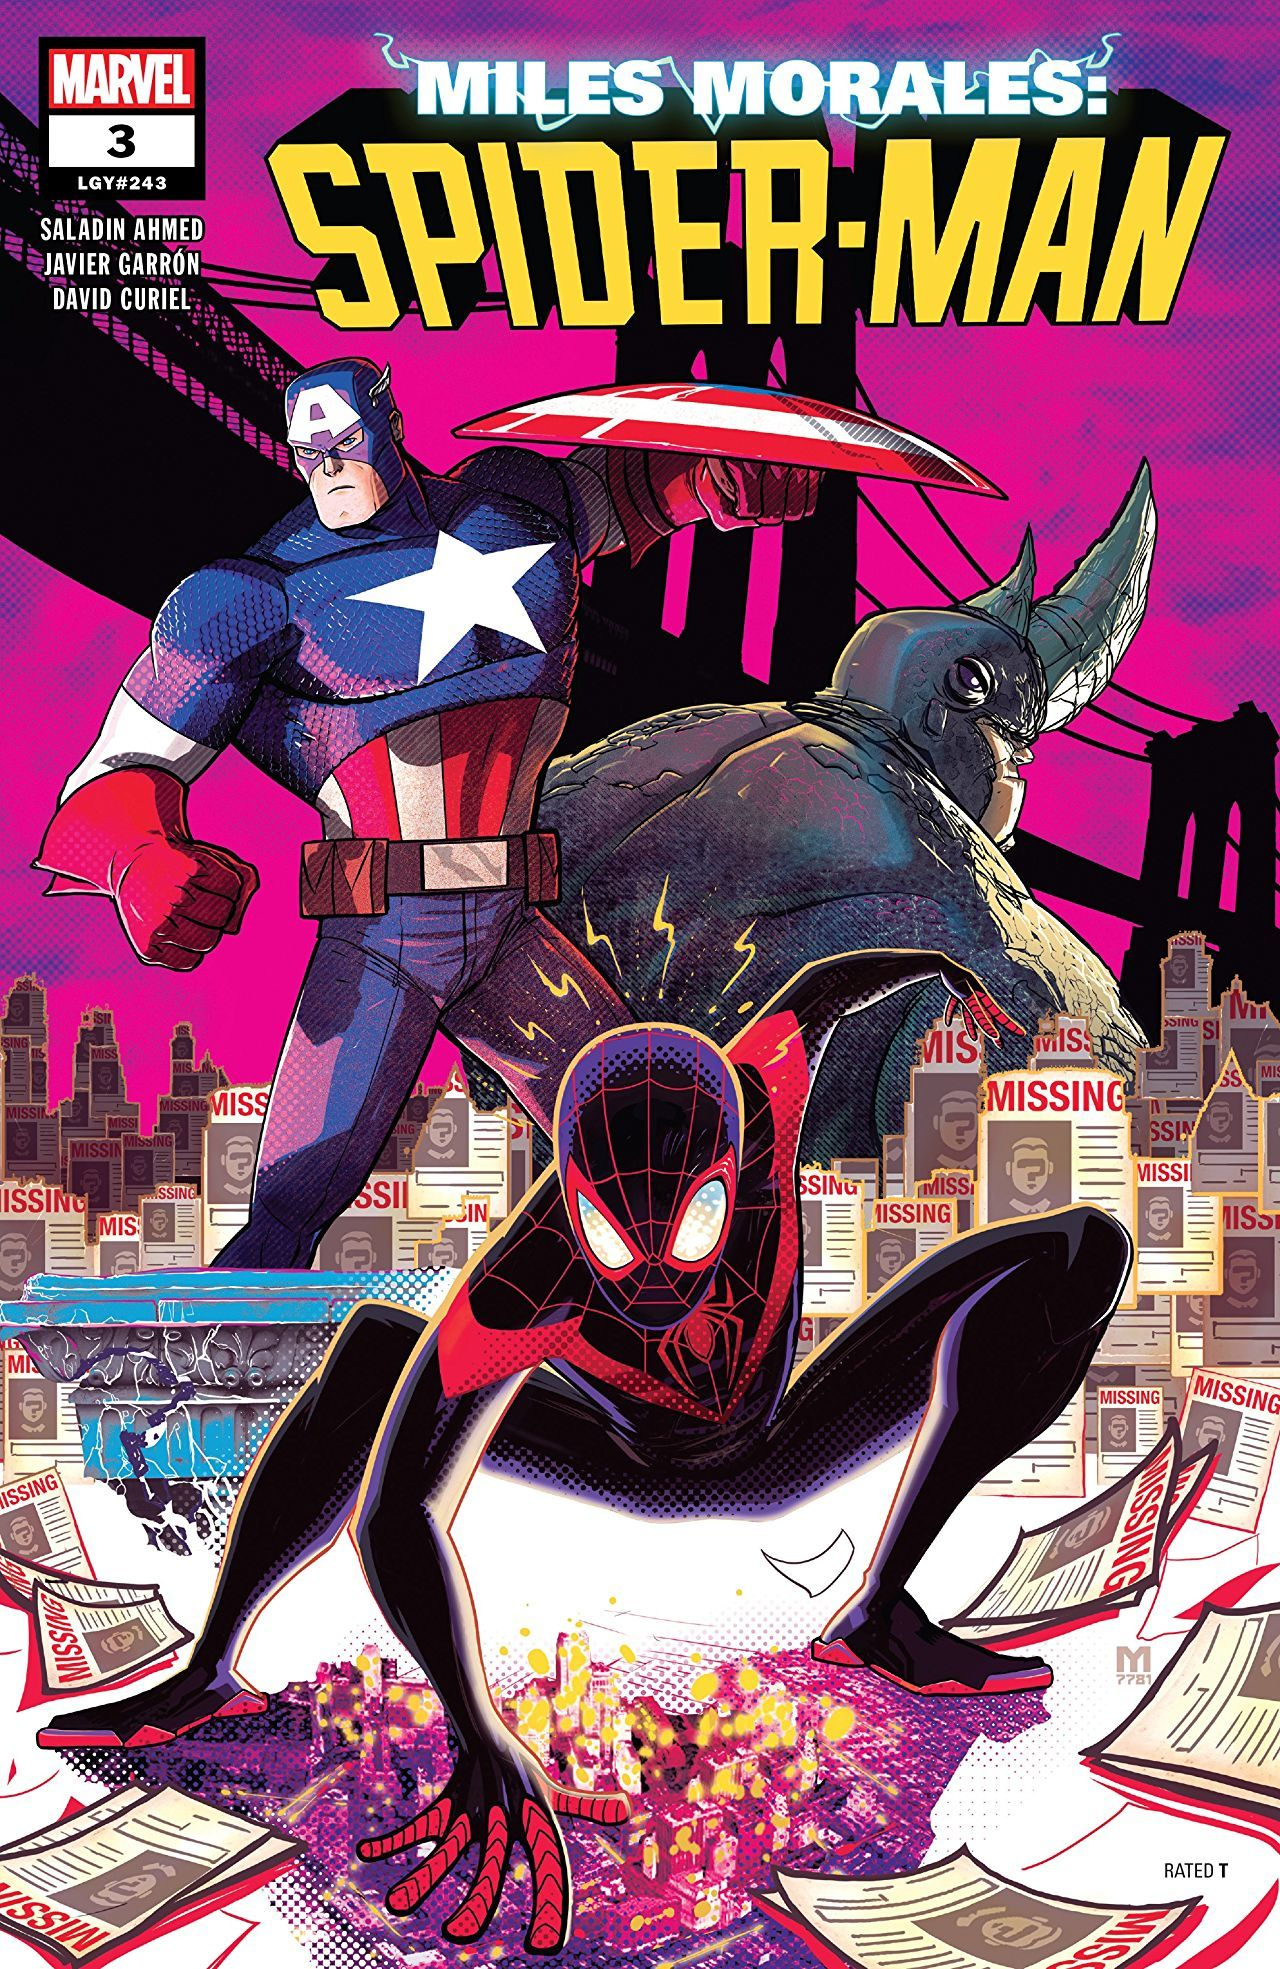 c4ff1b5b599 Miles Morales  Spider-Man  3 Review - Black Nerd Problems